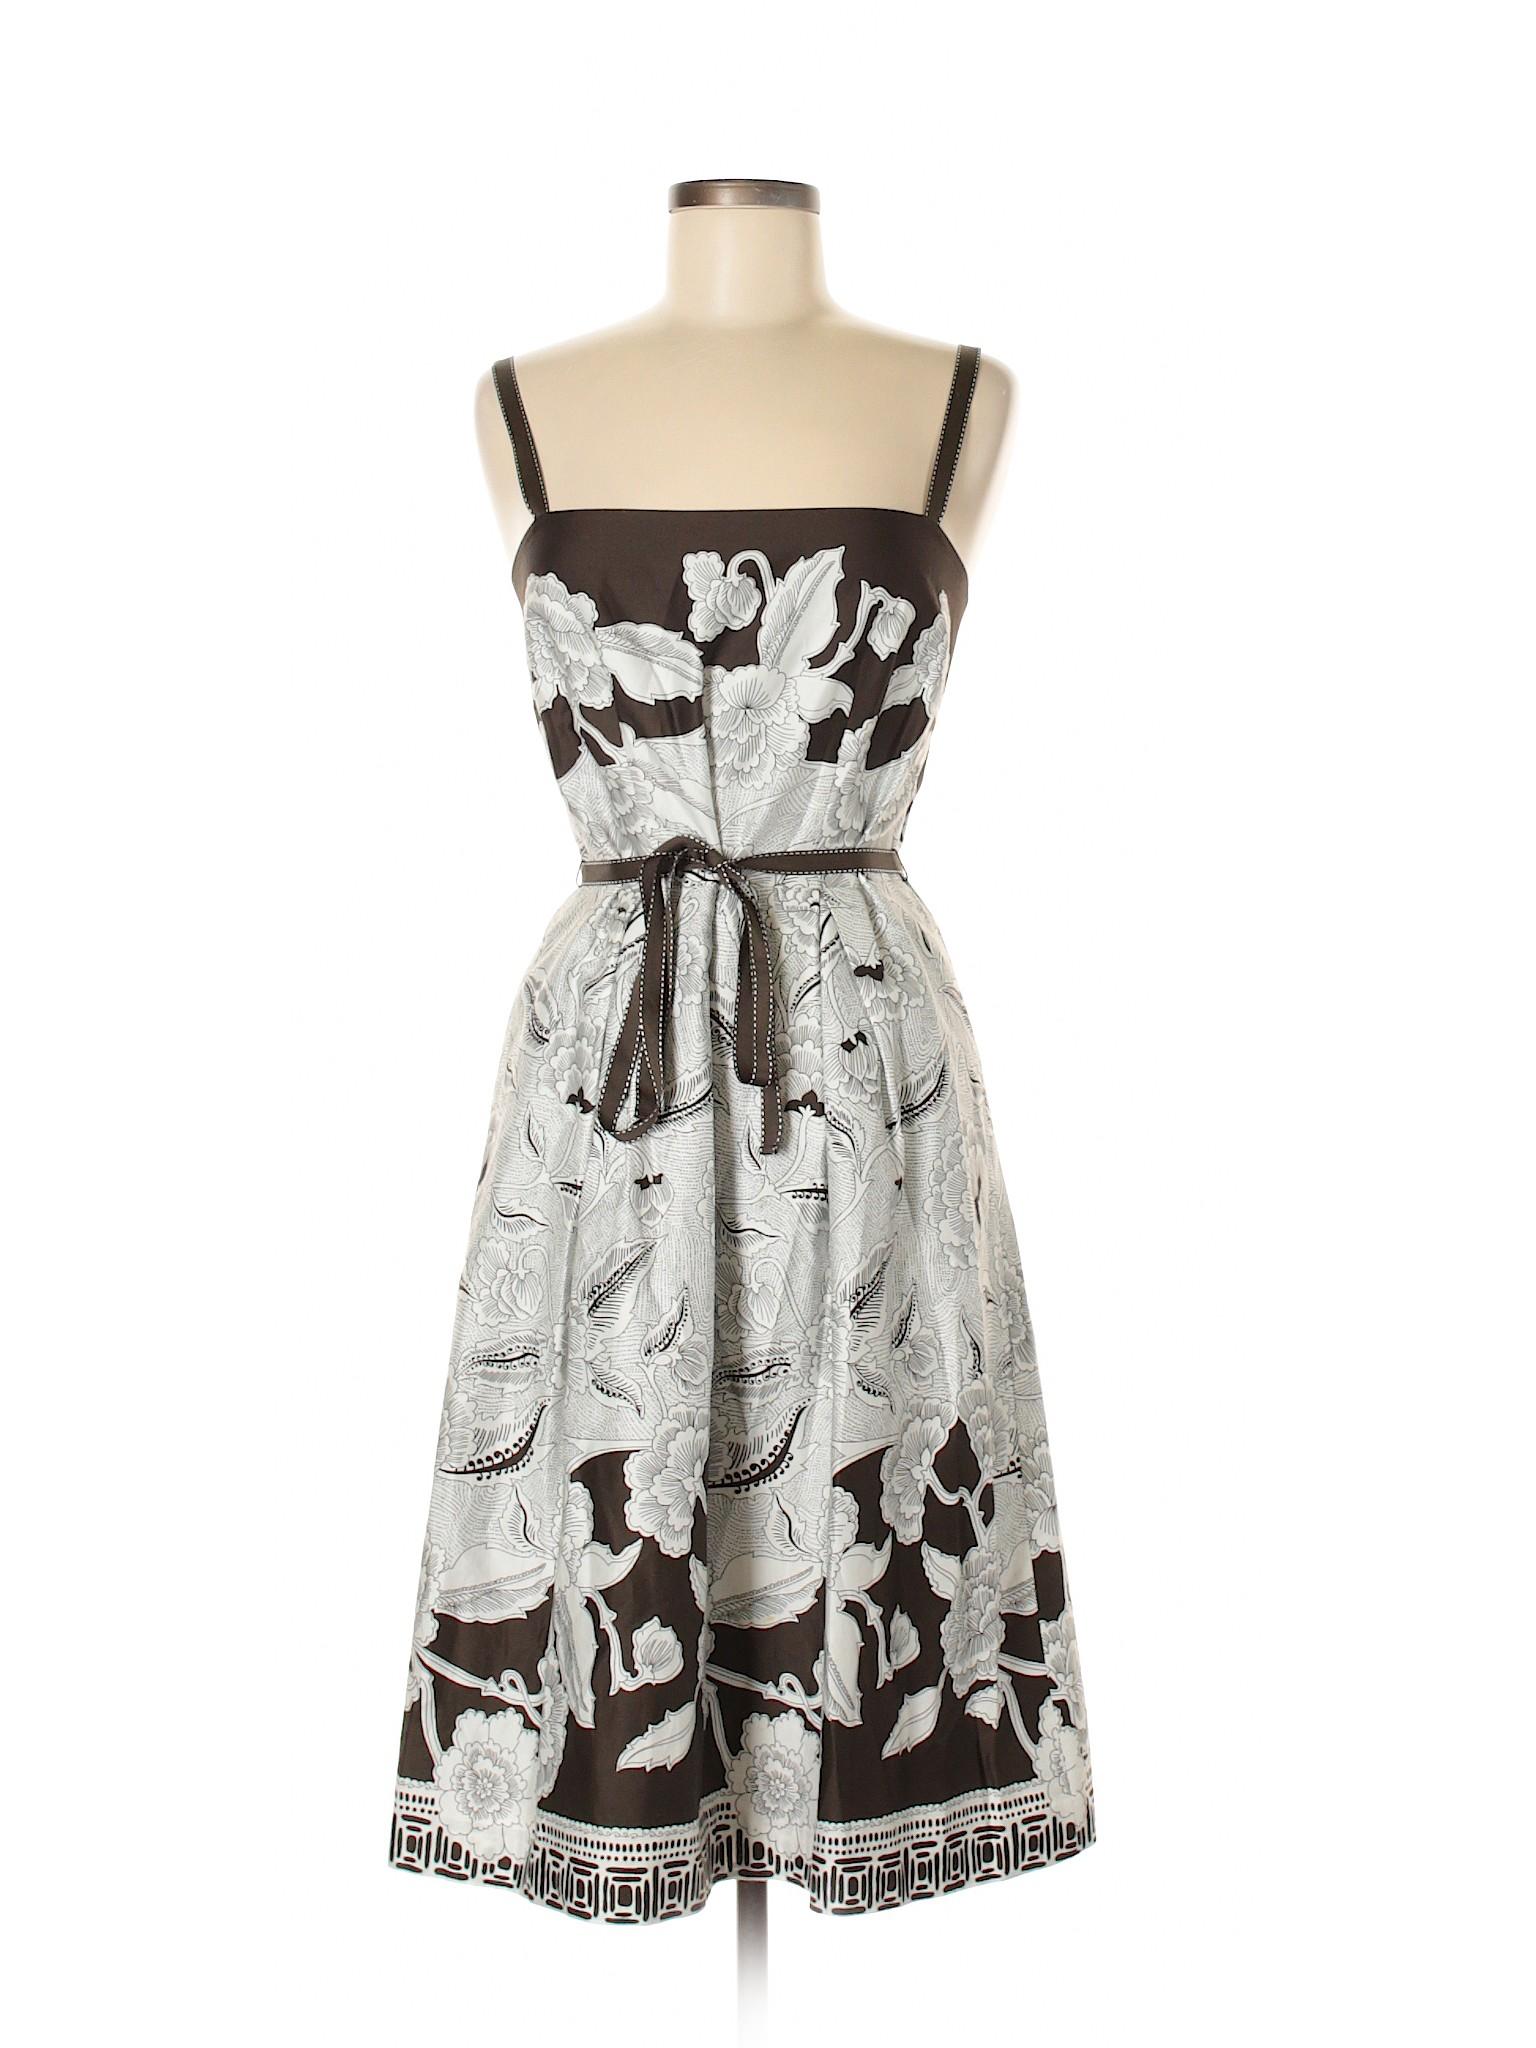 Casual Casual Taylor Ann Ann Taylor Selling Selling Dress Dress Selling Ann pnwxFASq47